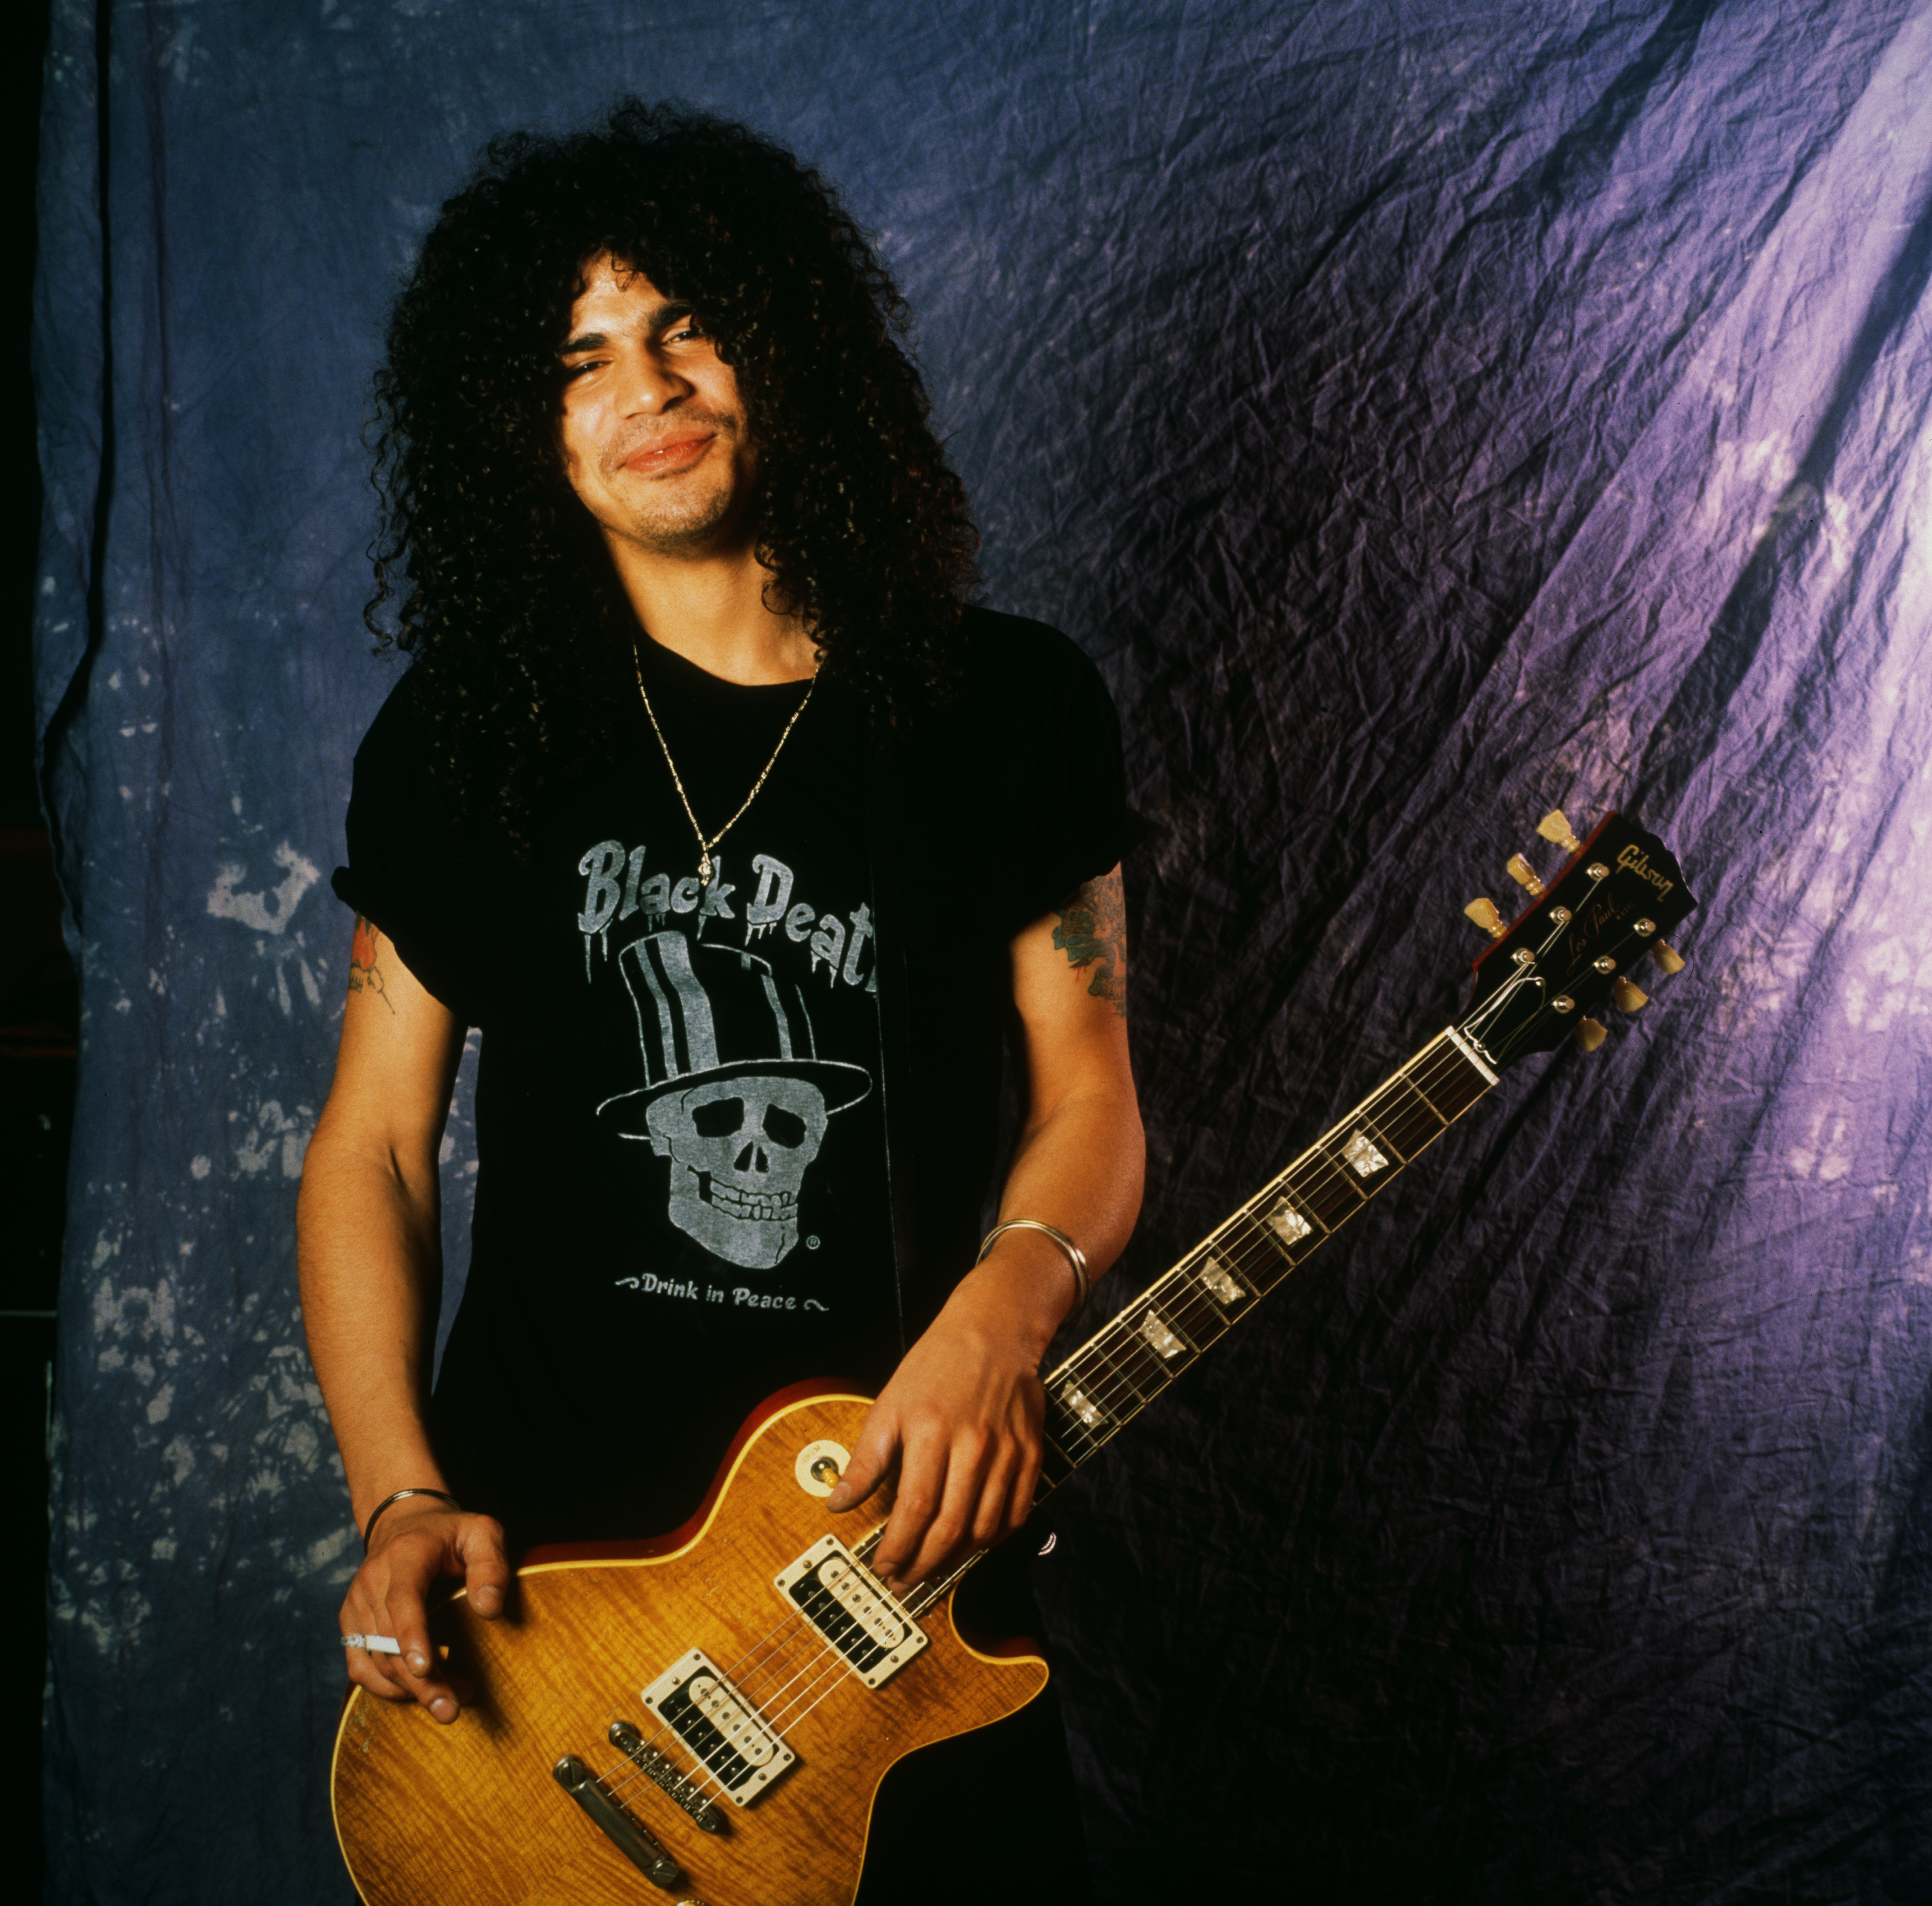 Slash Guns N Roses : slash guns n 39 roses lead guitarist 1991 rolling stone interview rolling stone ~ Russianpoet.info Haus und Dekorationen